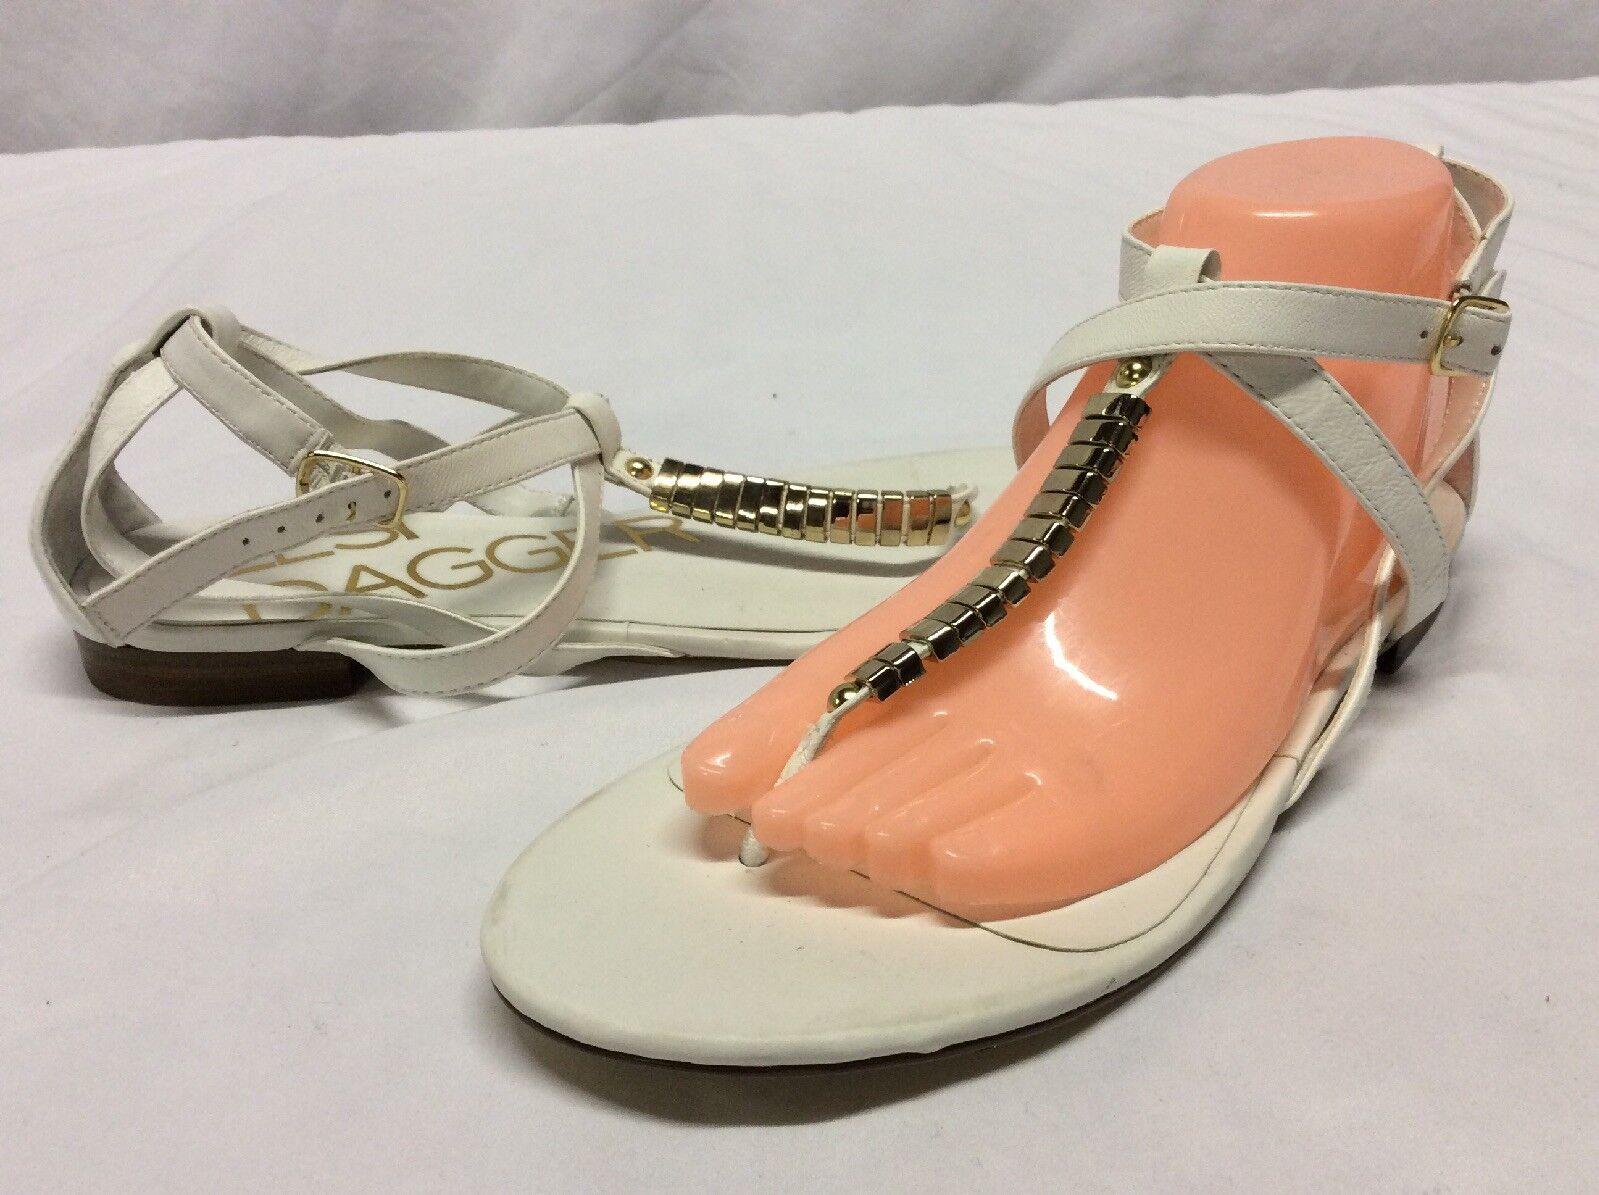 Kelsi Dagger Women's Flat Sandals,  Retail.White Leather,Size10 M....SANDS 3